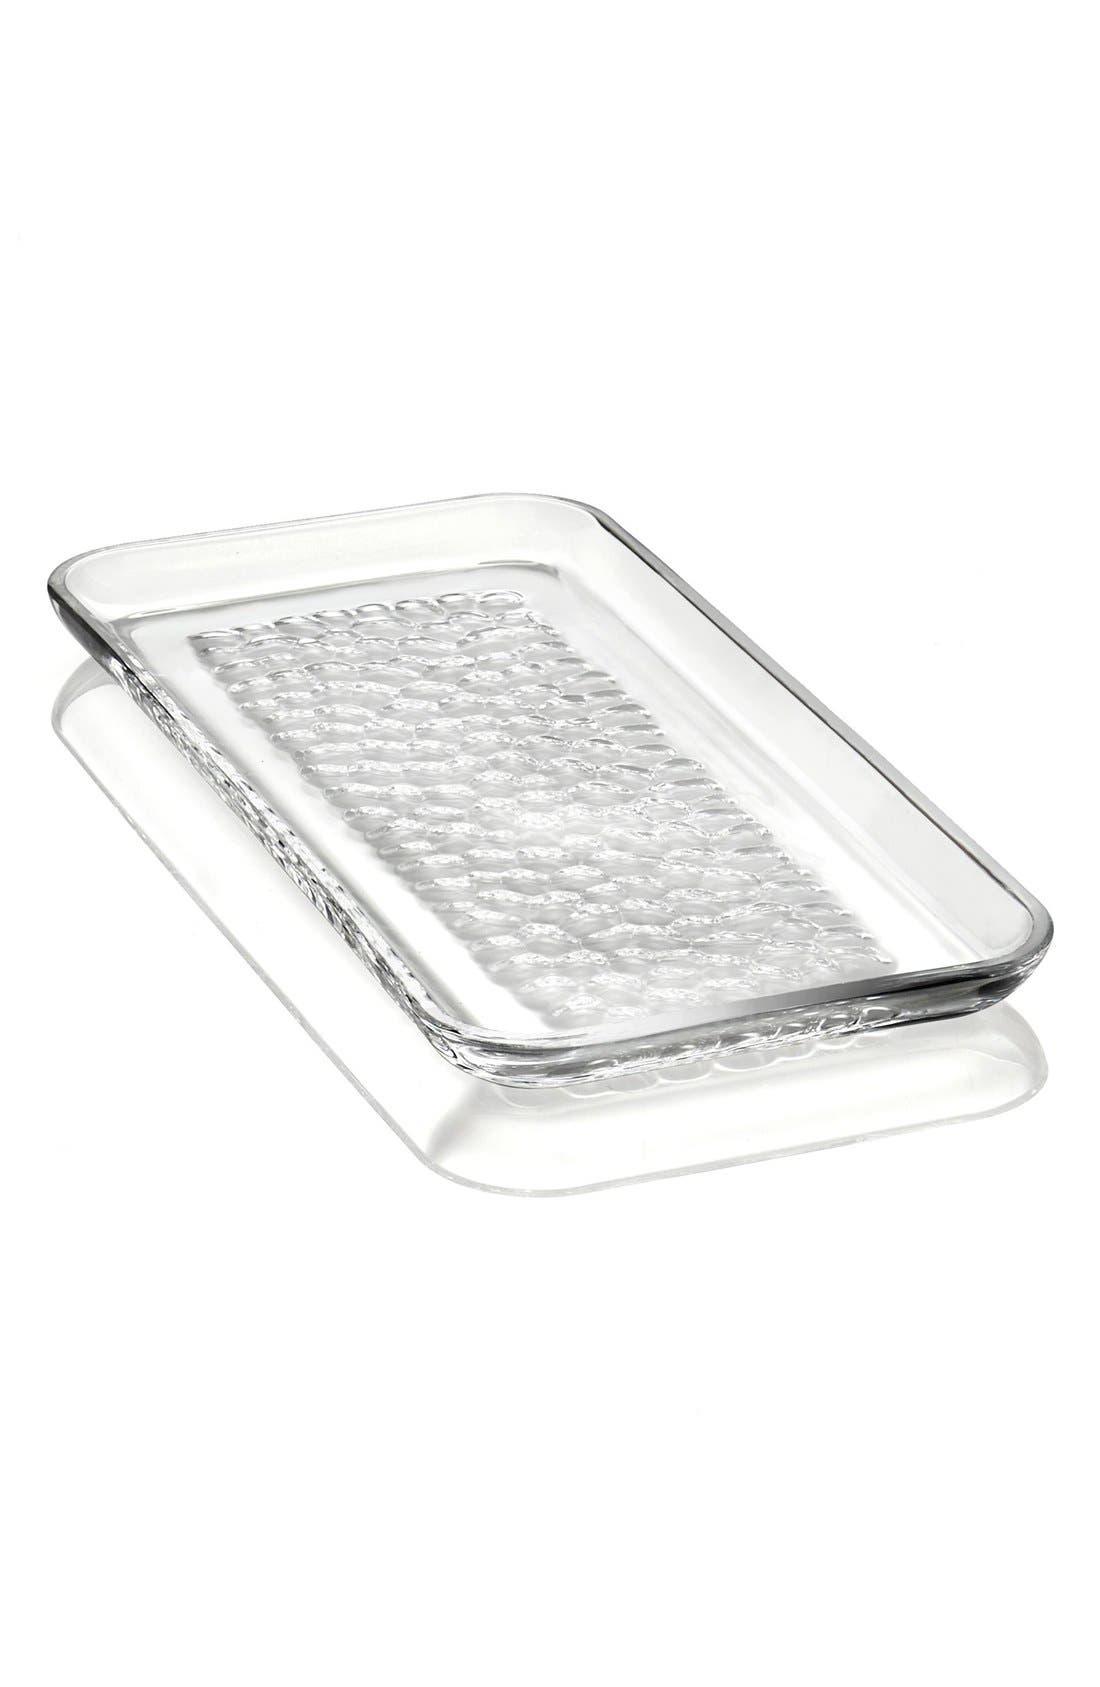 Main Image - Orrefors 'Pearl' Rectangular Lead Crystal Platter